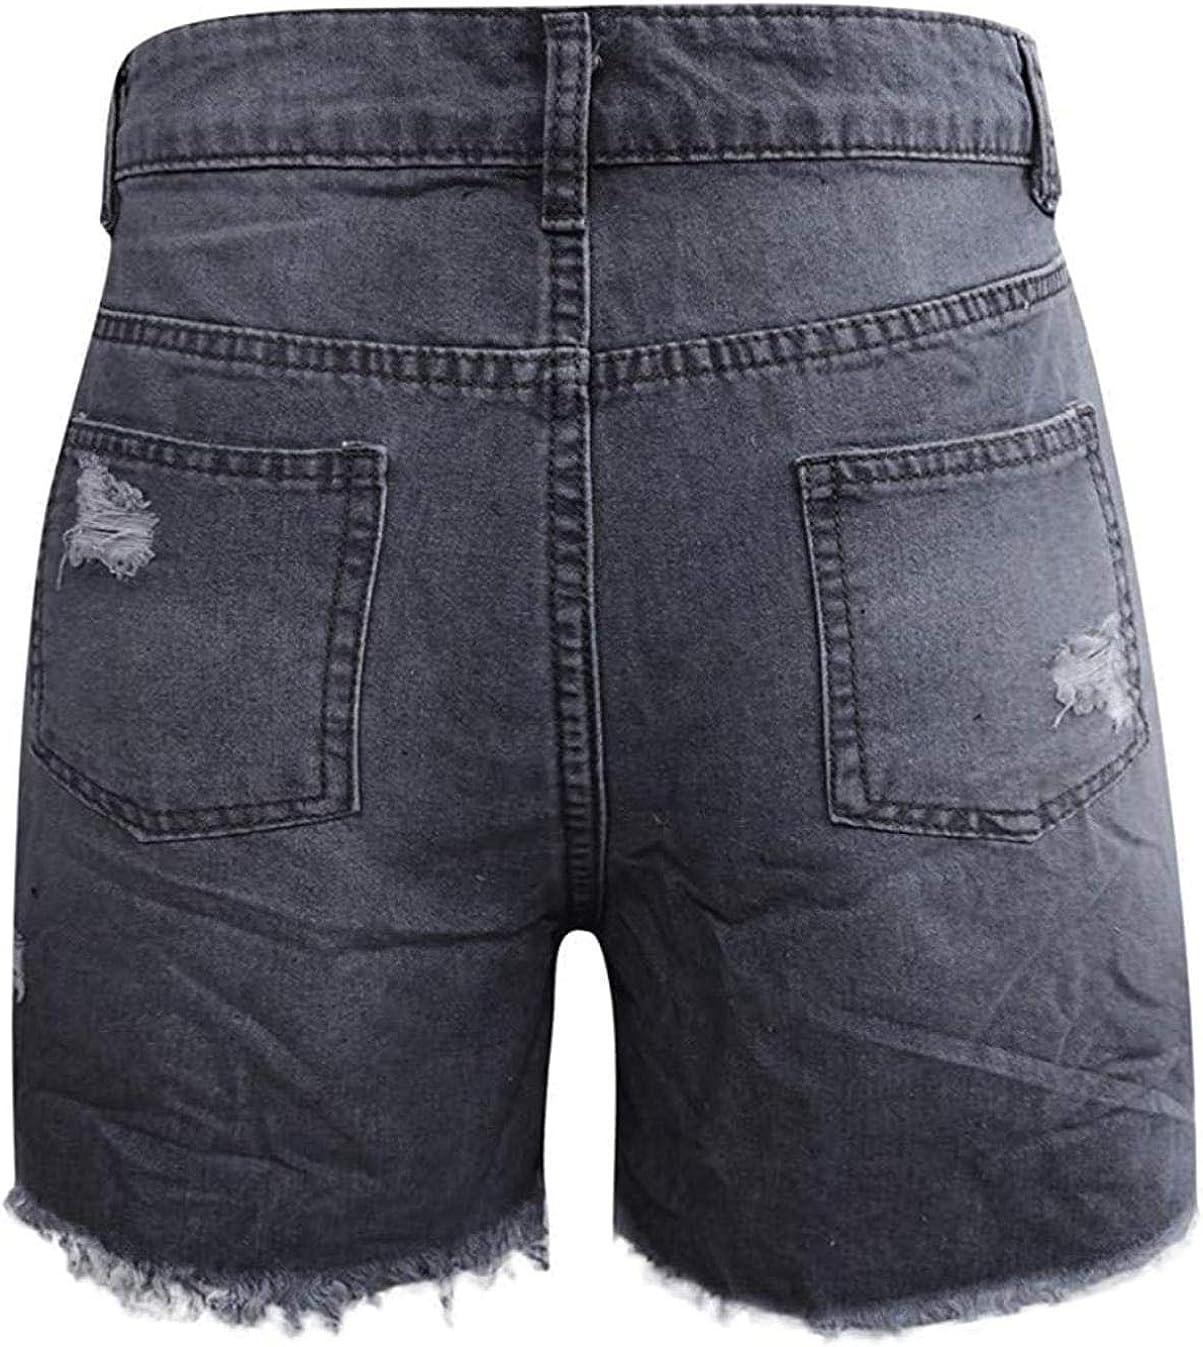 Tayaho Women Short Jeans Summer Sexy Denim Female Pockets Sport Wash Denim Shorts